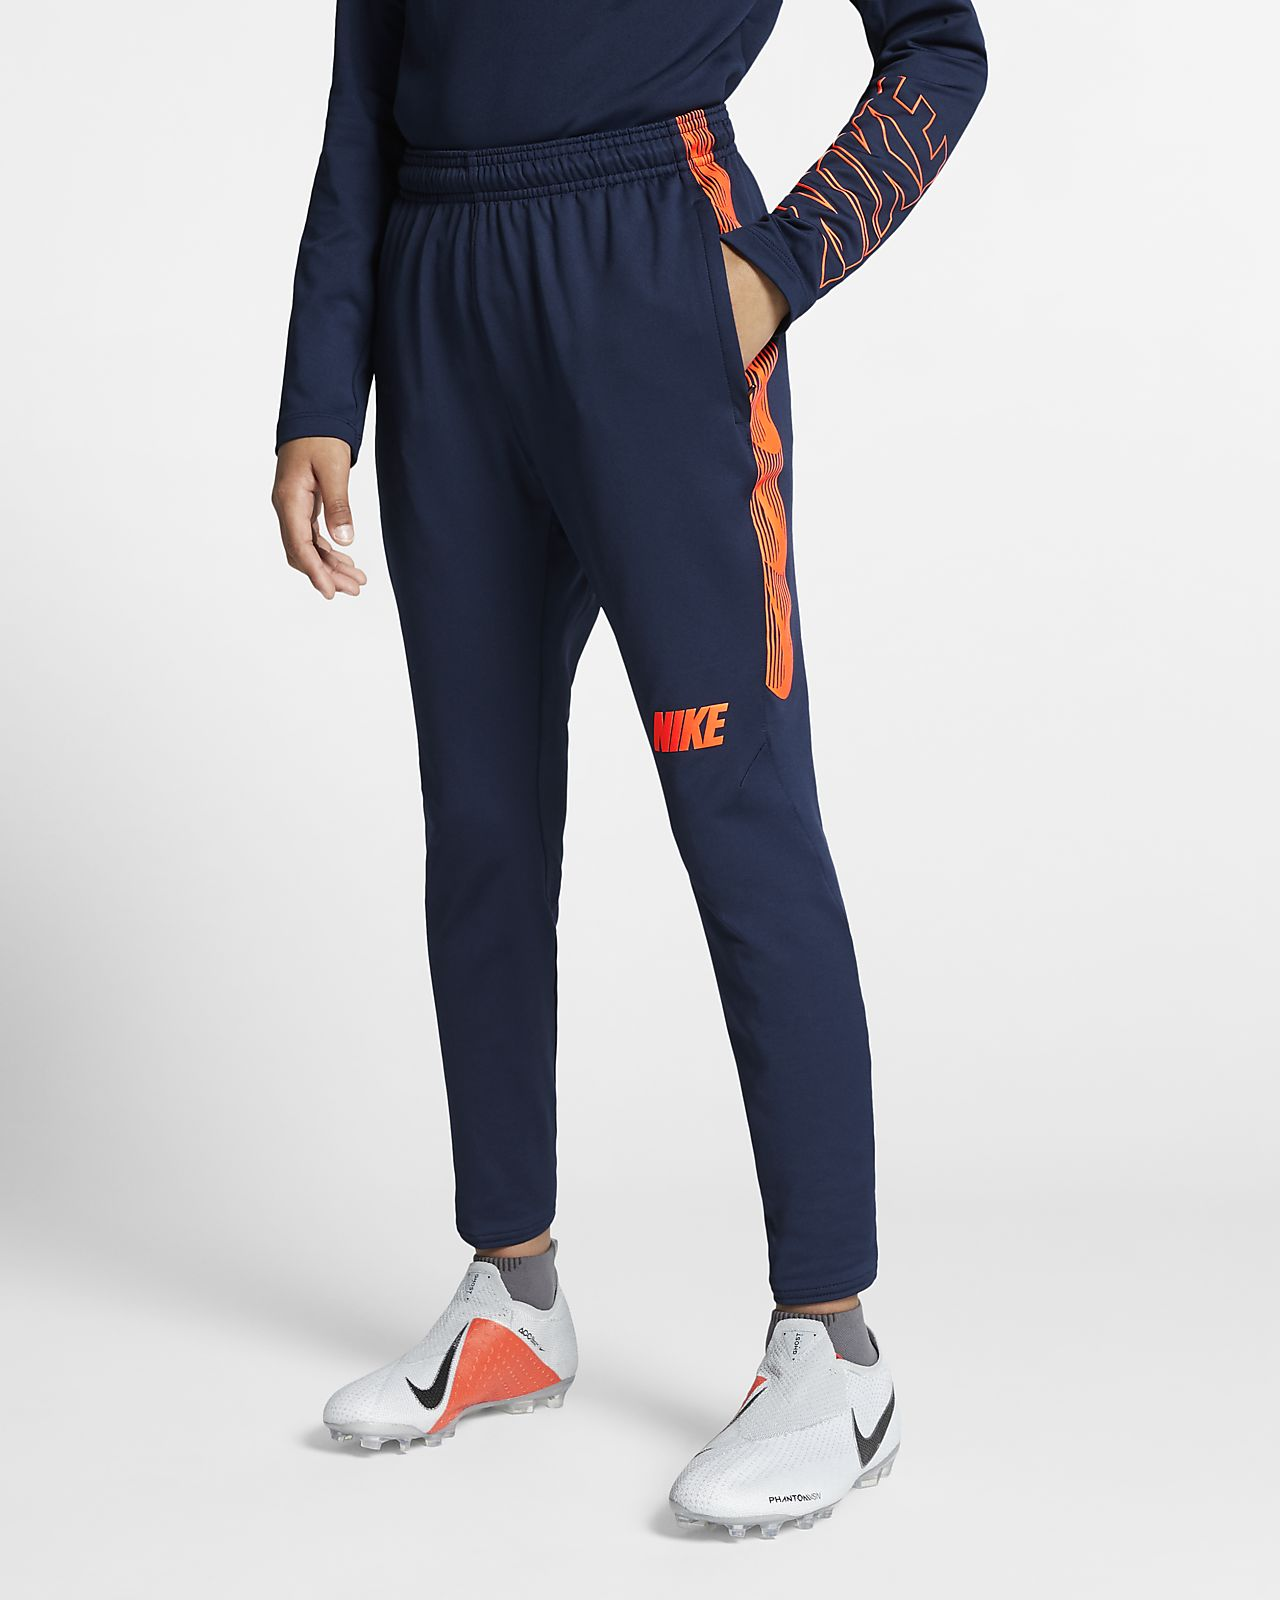 Pantalones de fútbol para niños talla grande Nike Dri-FIT Squad